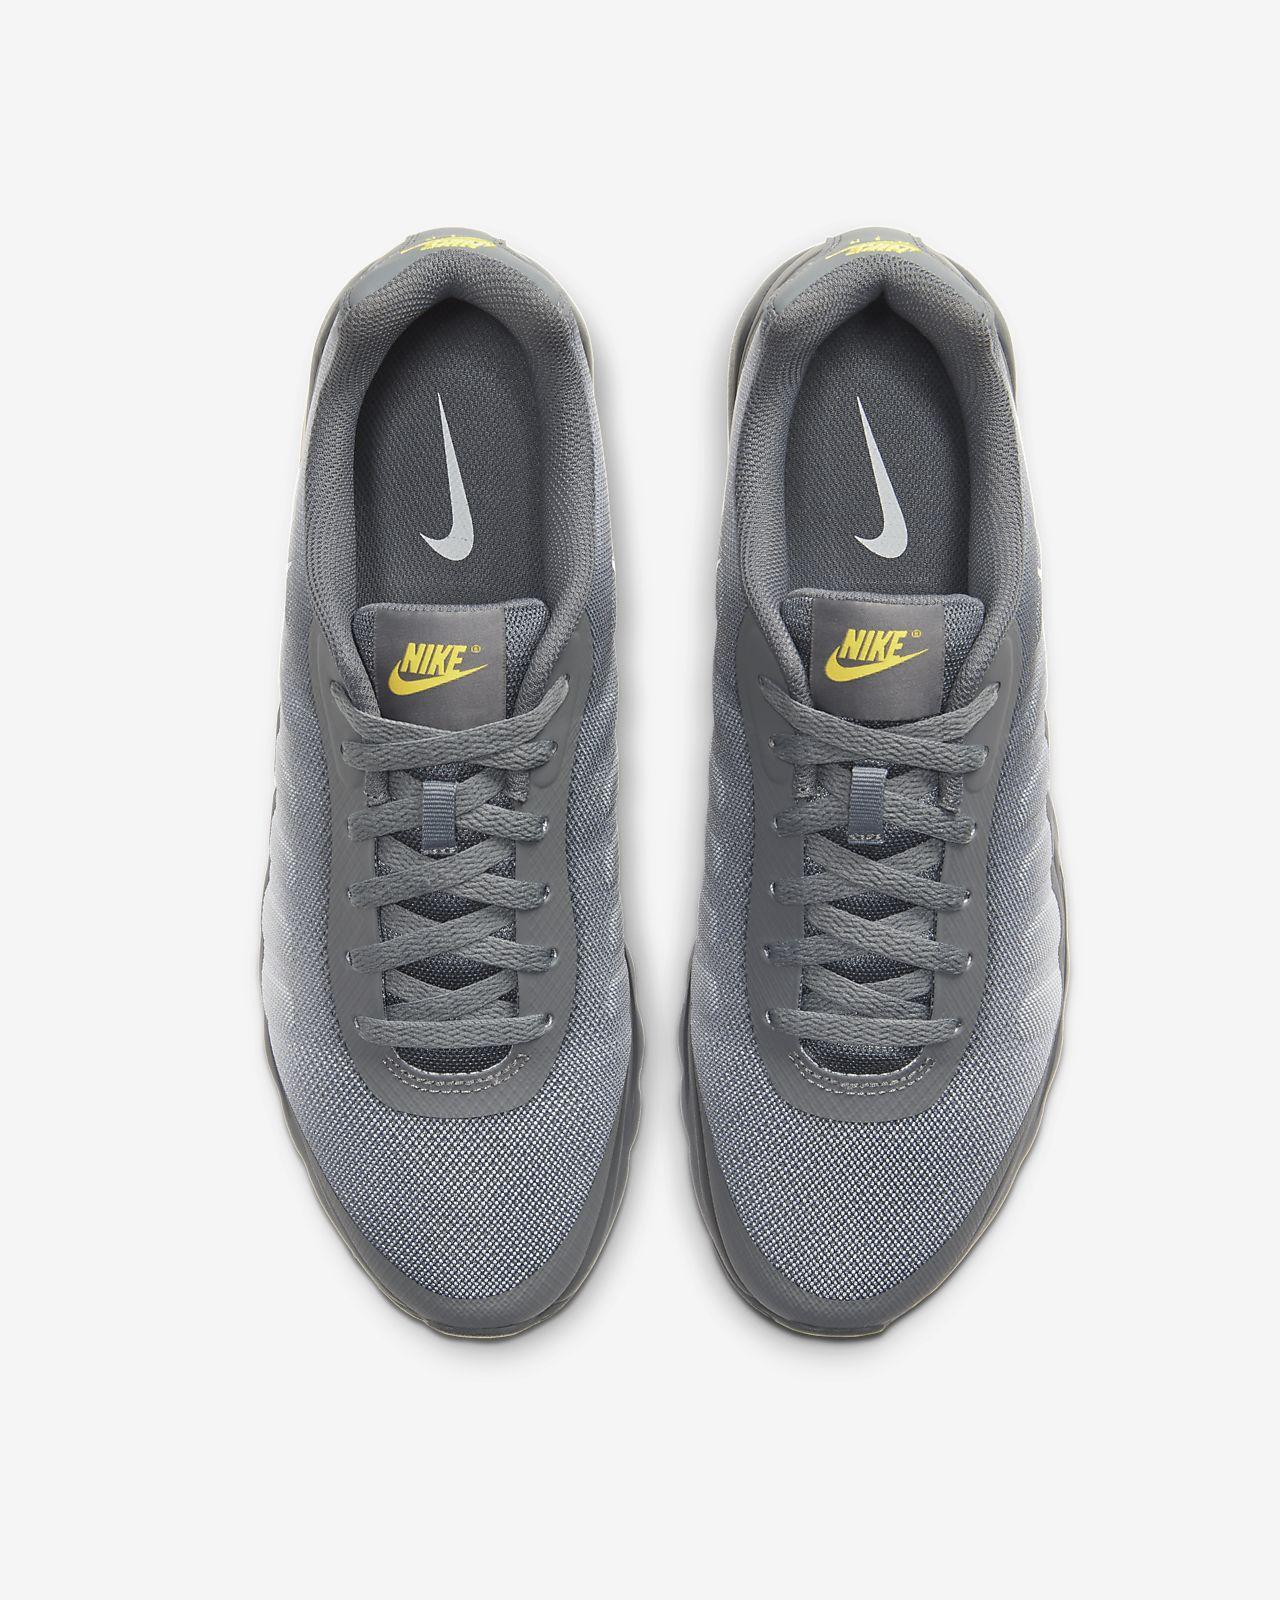 Nike Air Max Invigor Print Herrenschuh. Nike LU